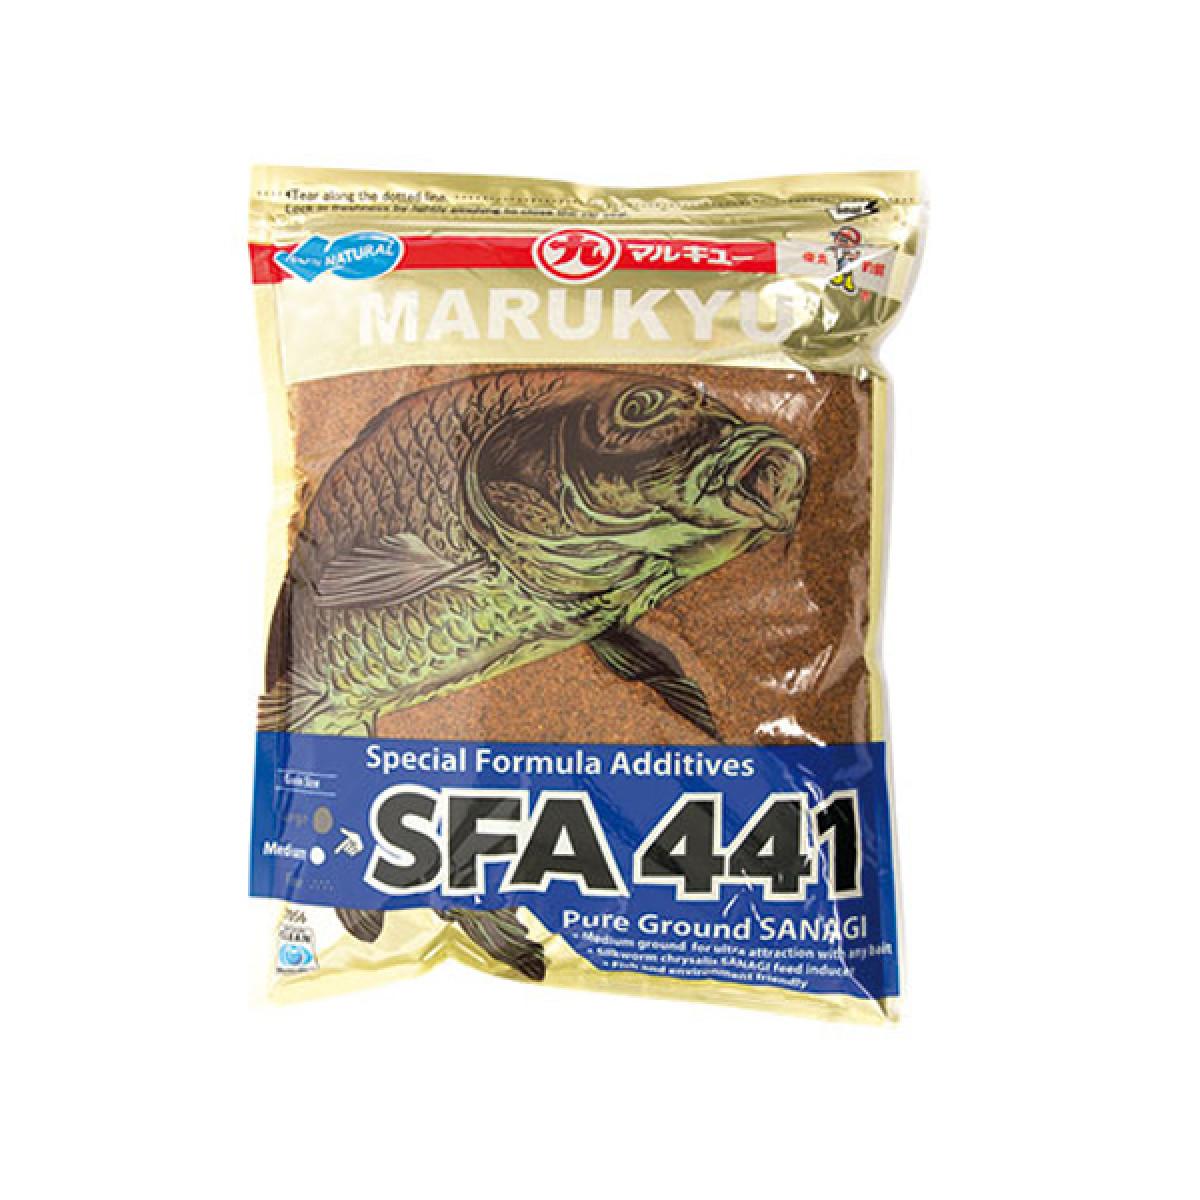 SFA 441